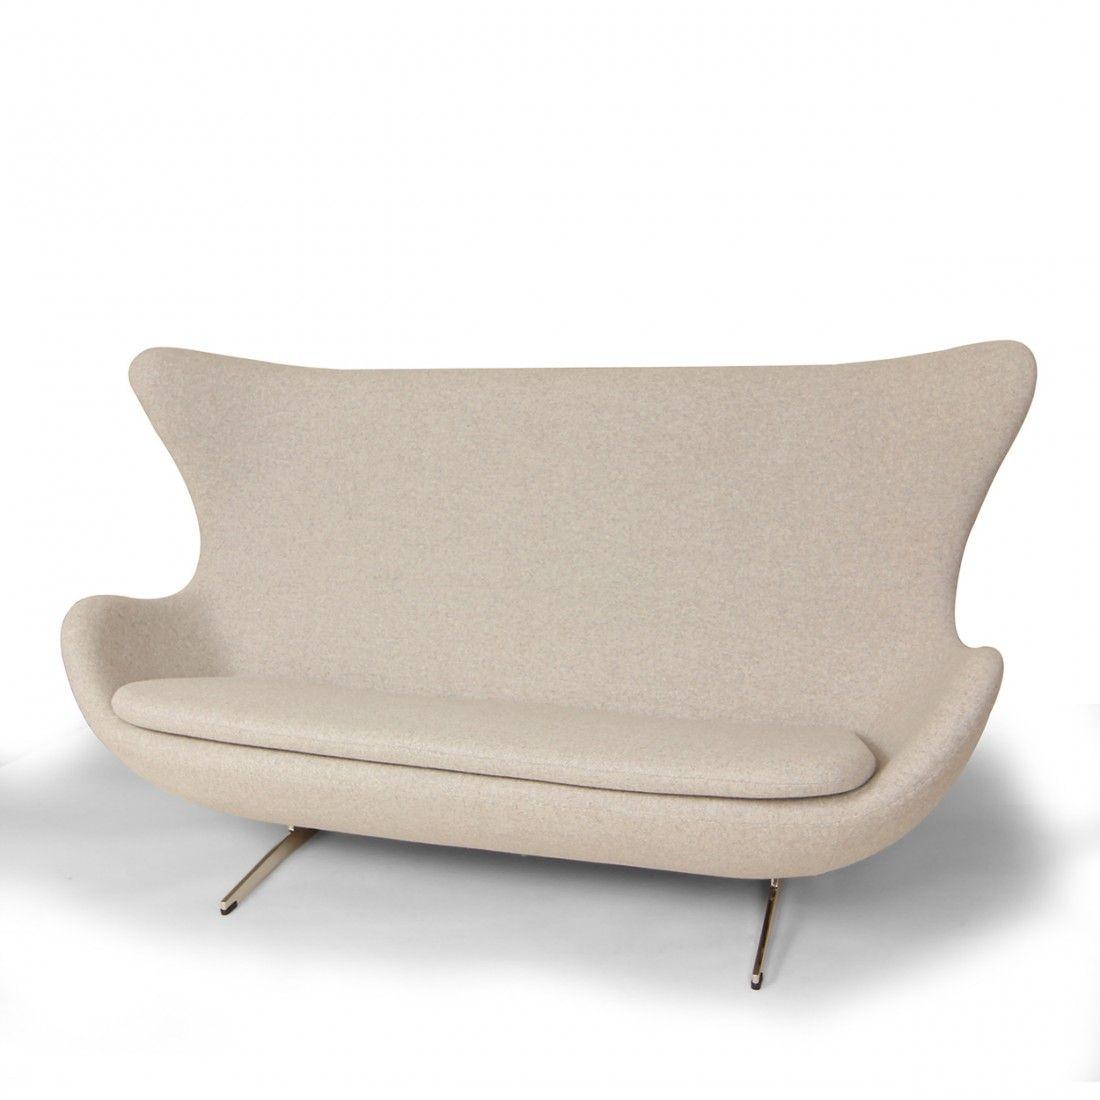 Mid Century Modern Reproduction Egg Sofa Inspired By Arne Jacobsen